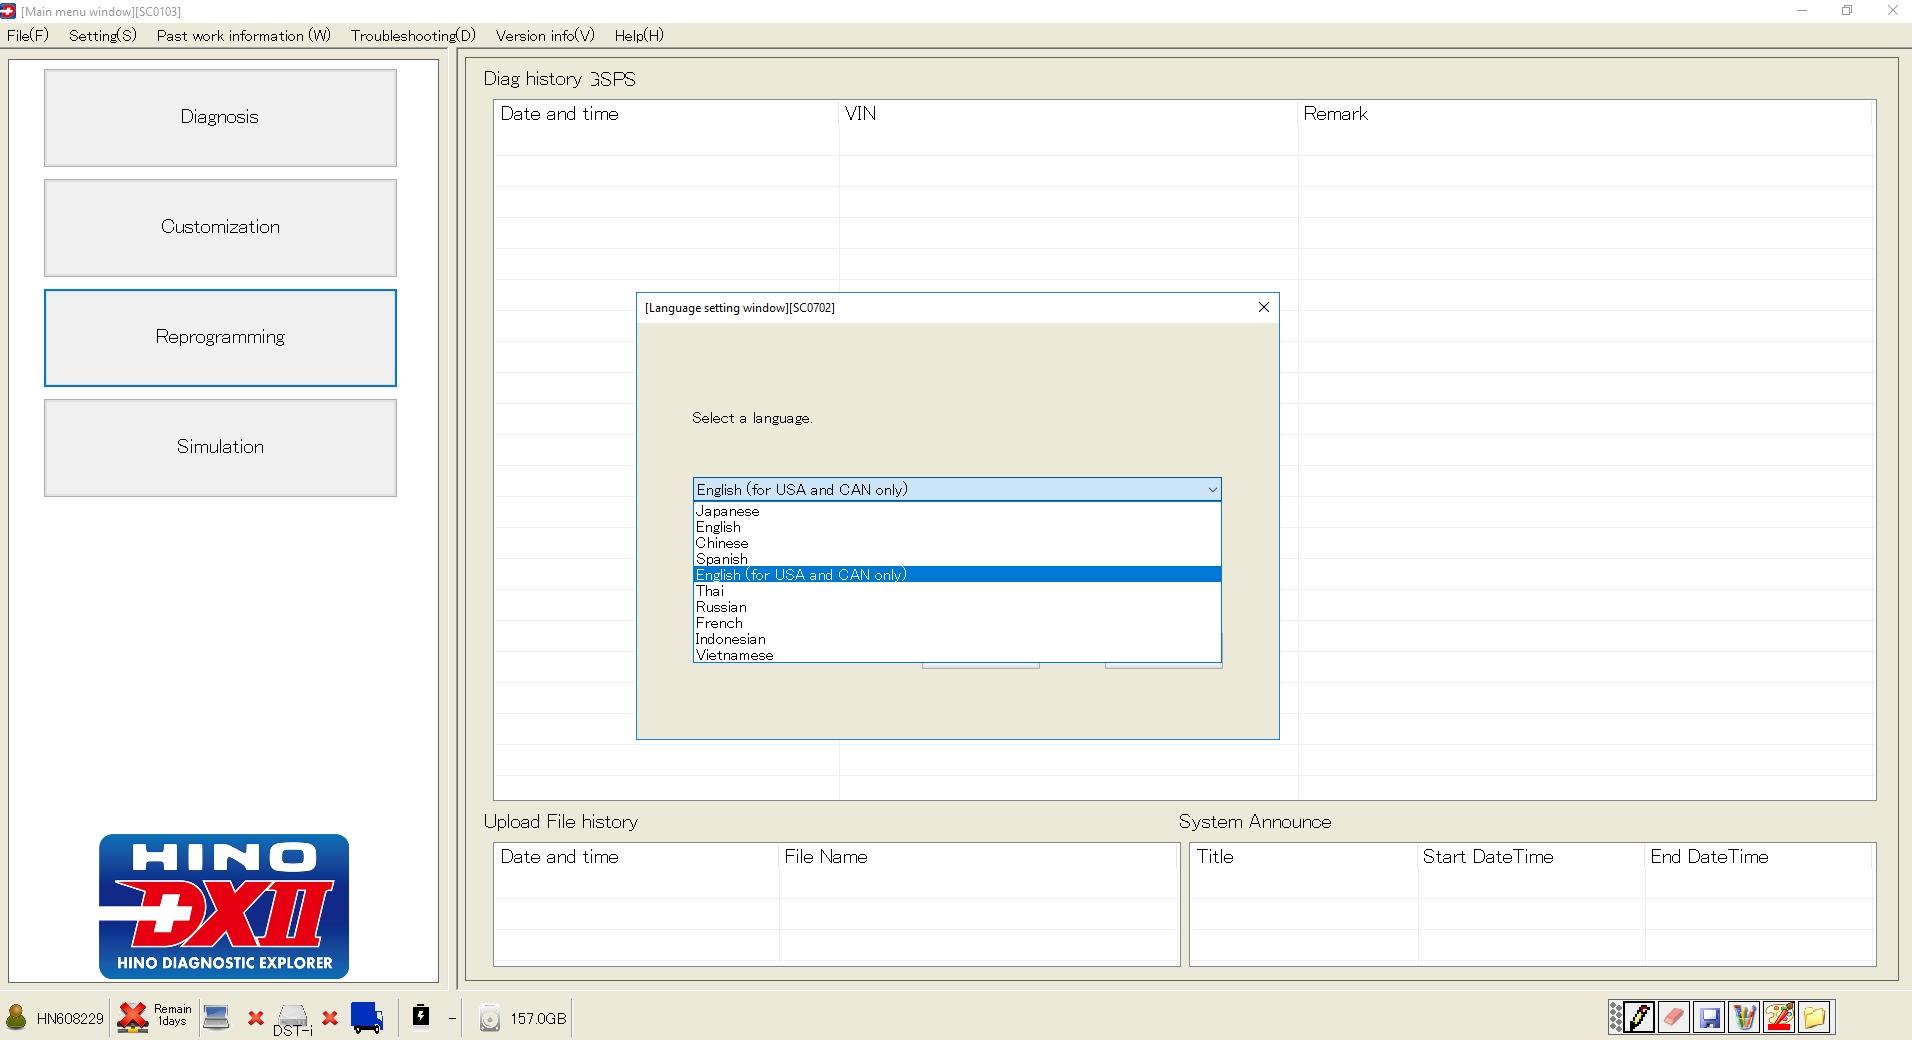 HINO_Diagnostic_eXplorer_DX2_11207_072020_Diagnostic_Software_10